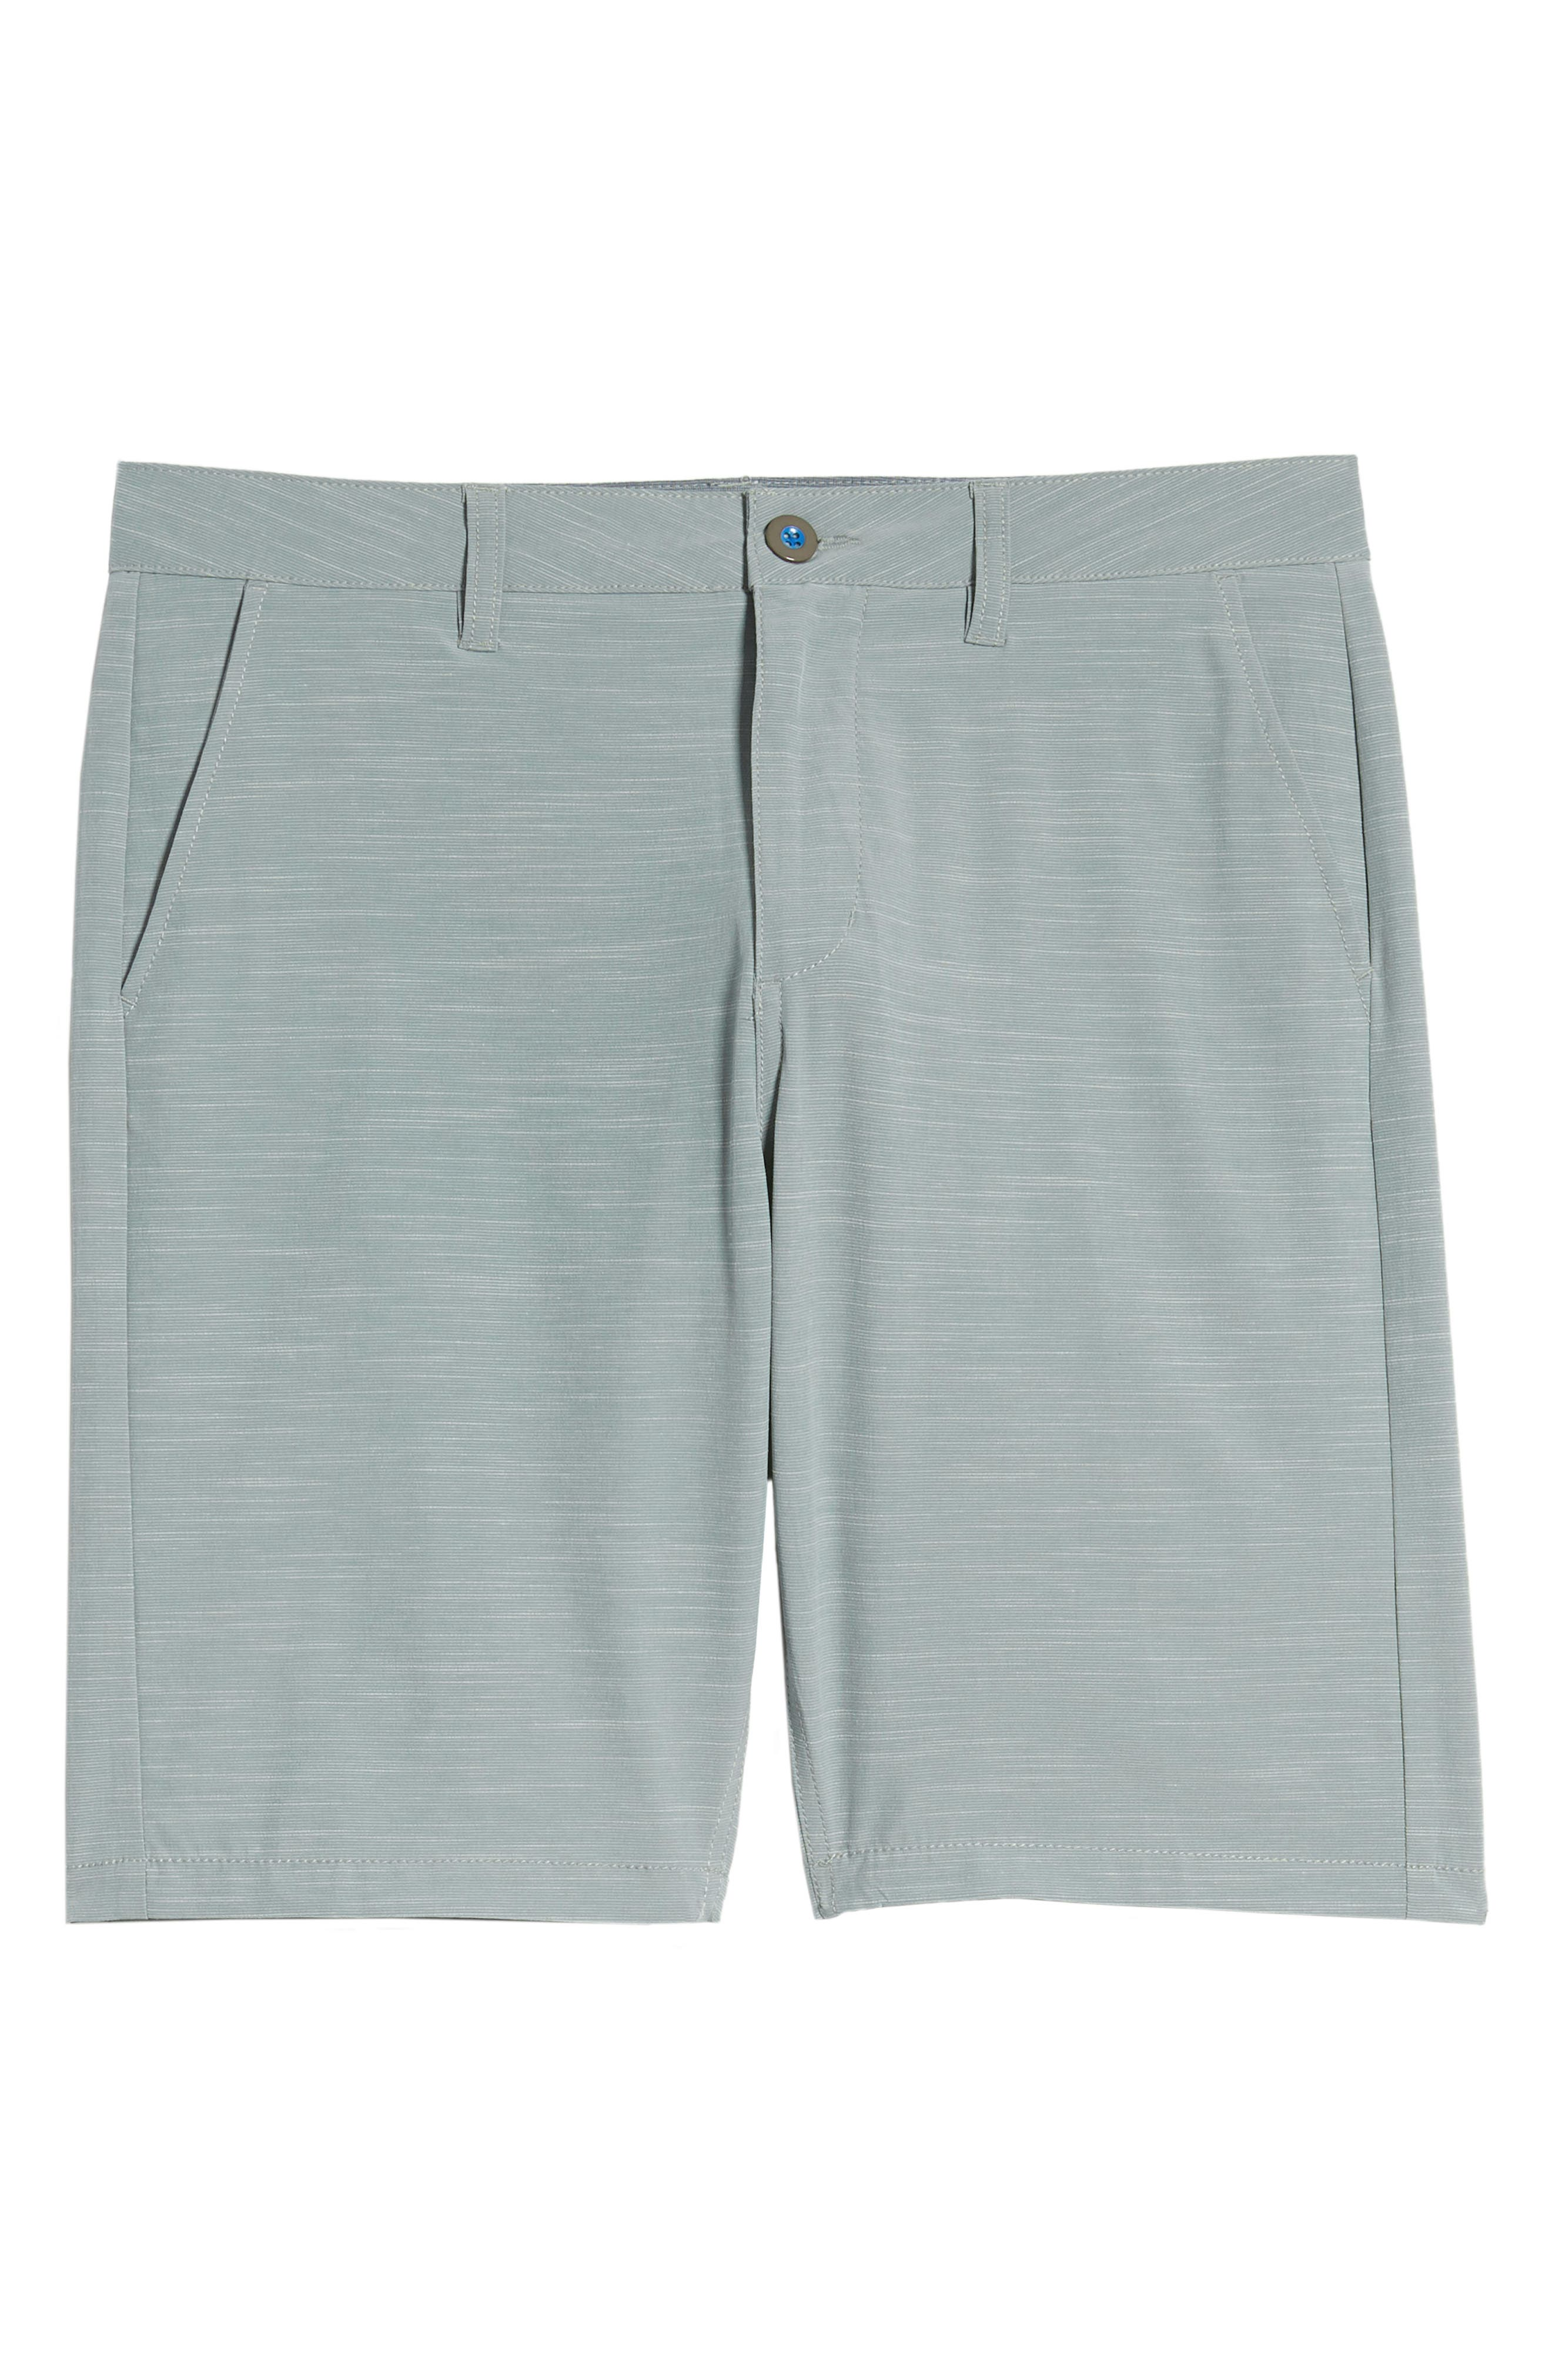 DEVEREUX, Cruiser Hybrid Shorts, Alternate thumbnail 6, color, SMOKE GREEN